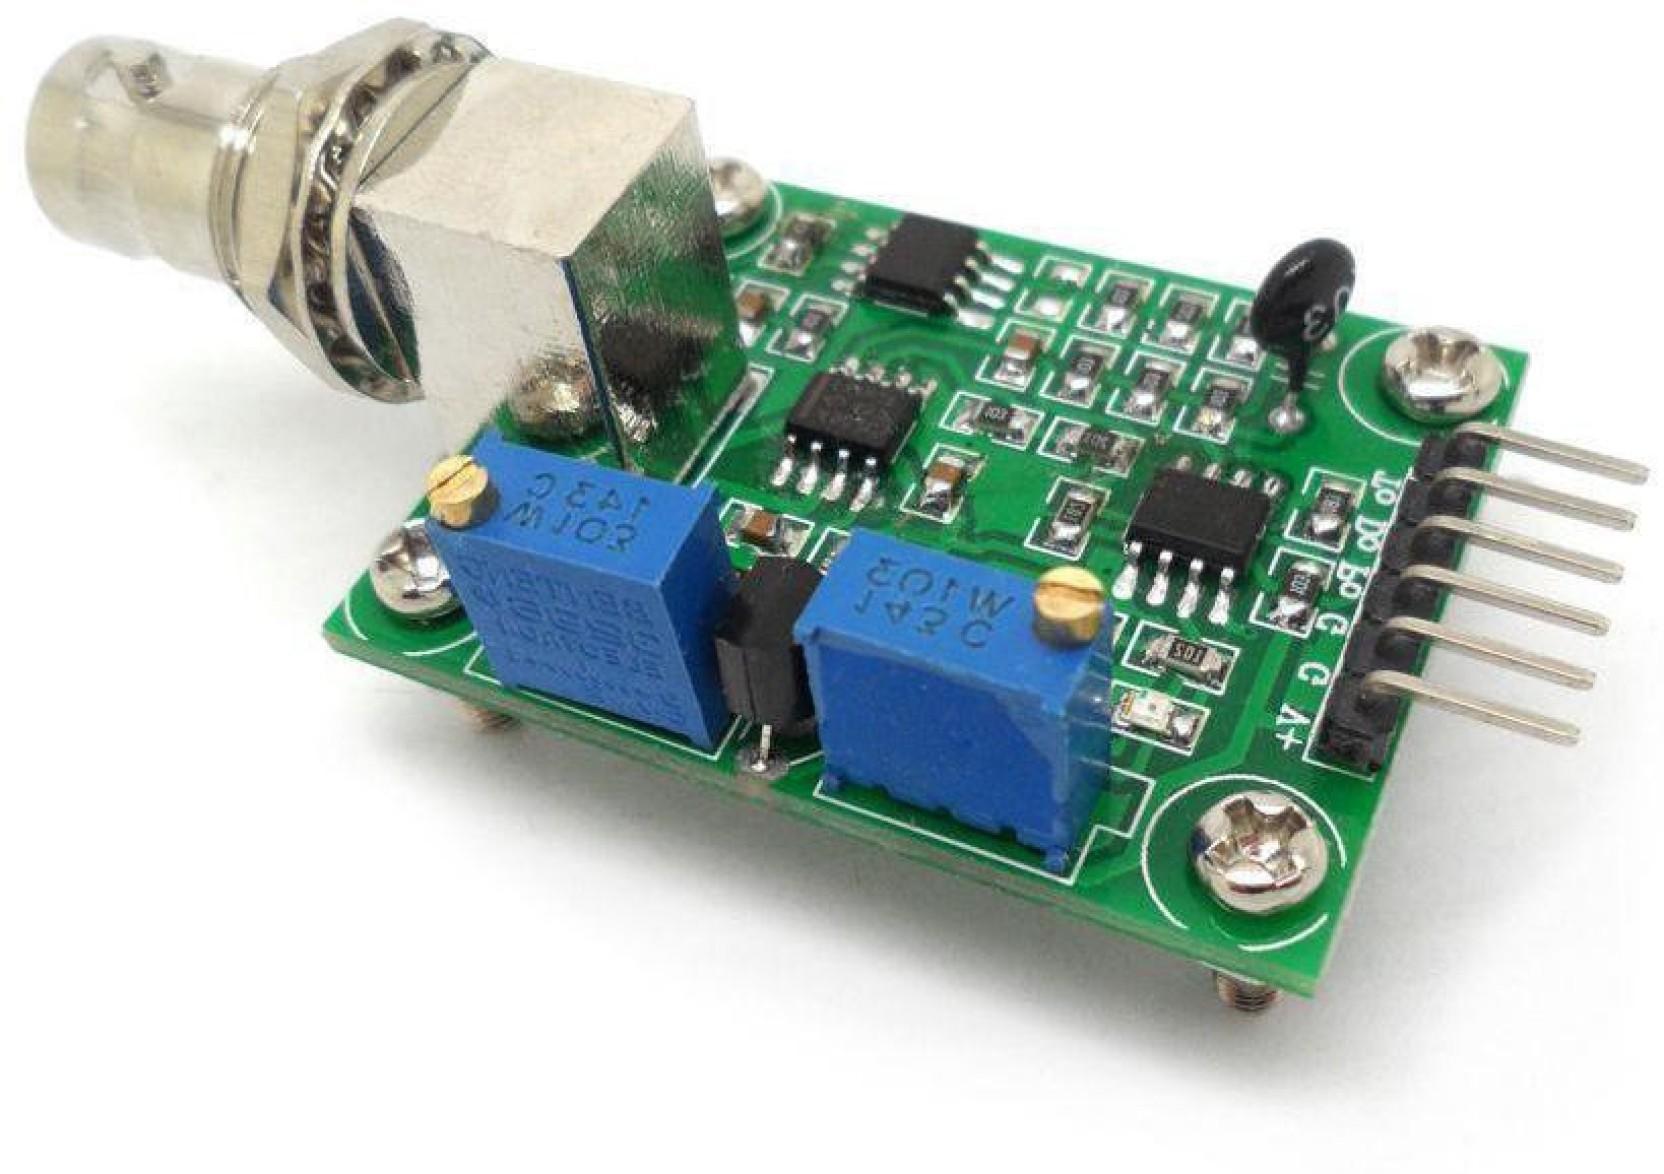 Technologybazar Liquid P H Value Detection Regulator Sensor Module Sensing Circuits Sensors Detectors Home Toys Hobby Kits